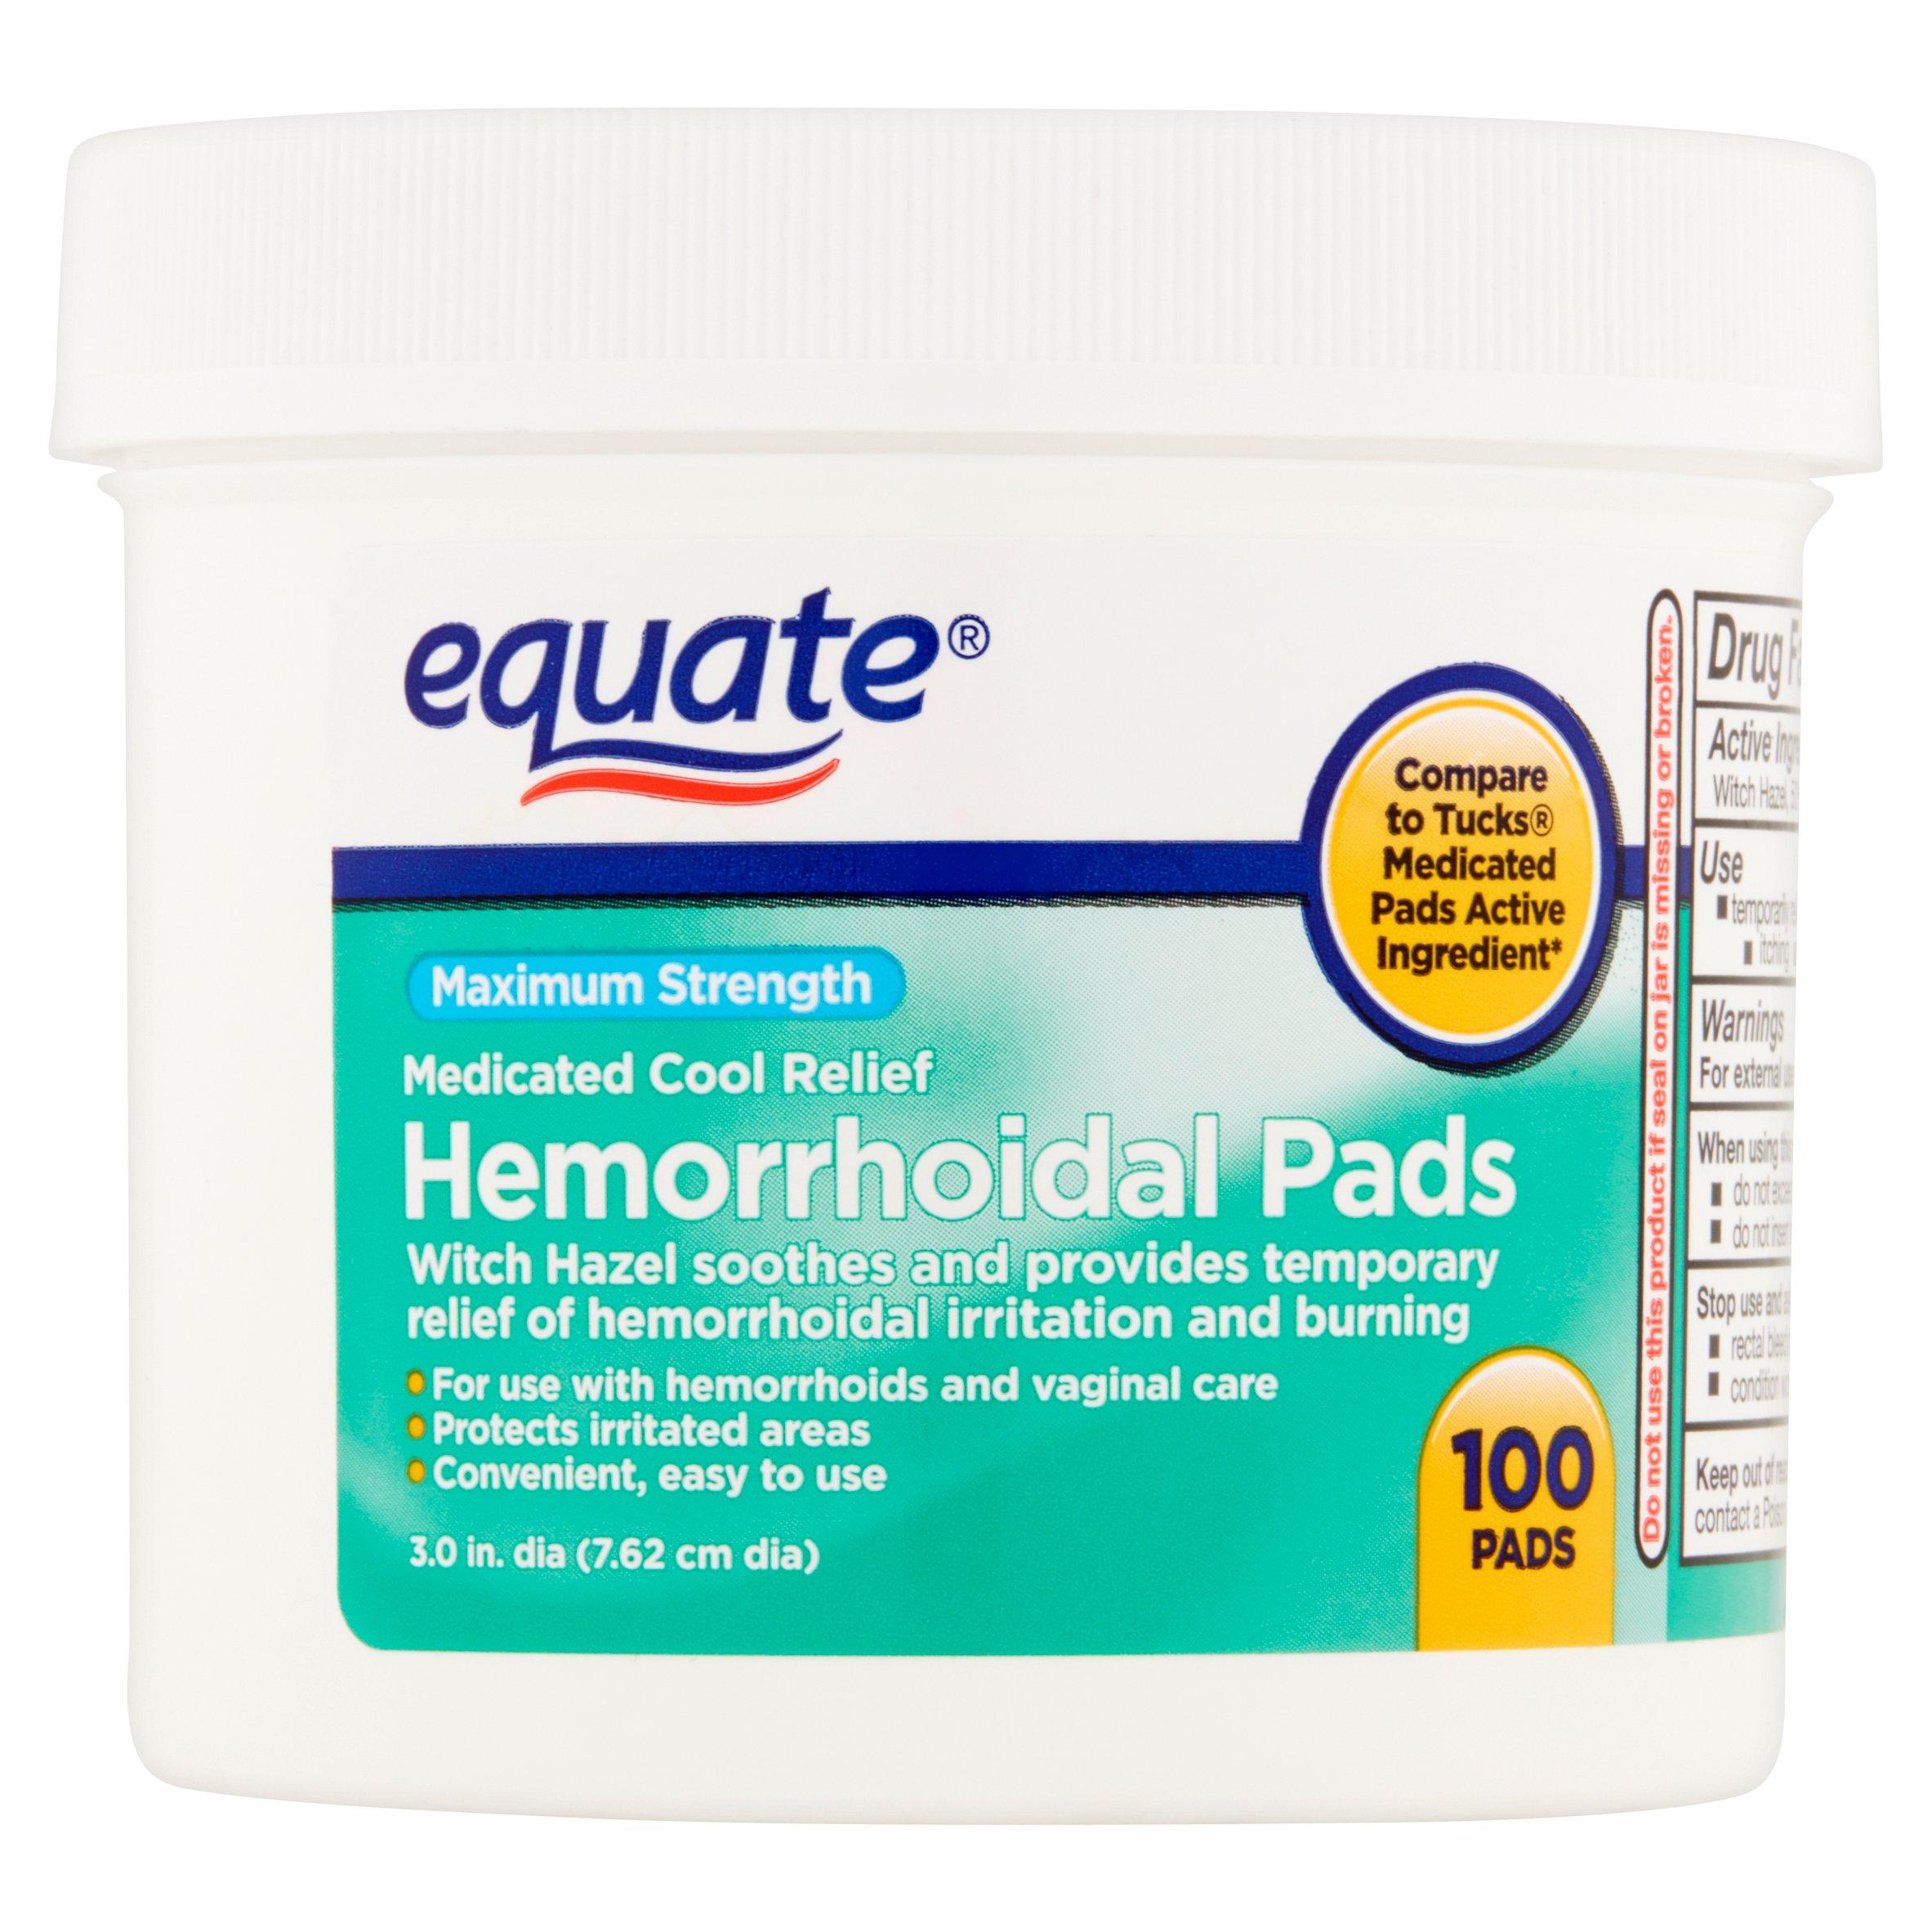 Equate Maximum Strength Hemorrhoidal Pads, 100 Ct